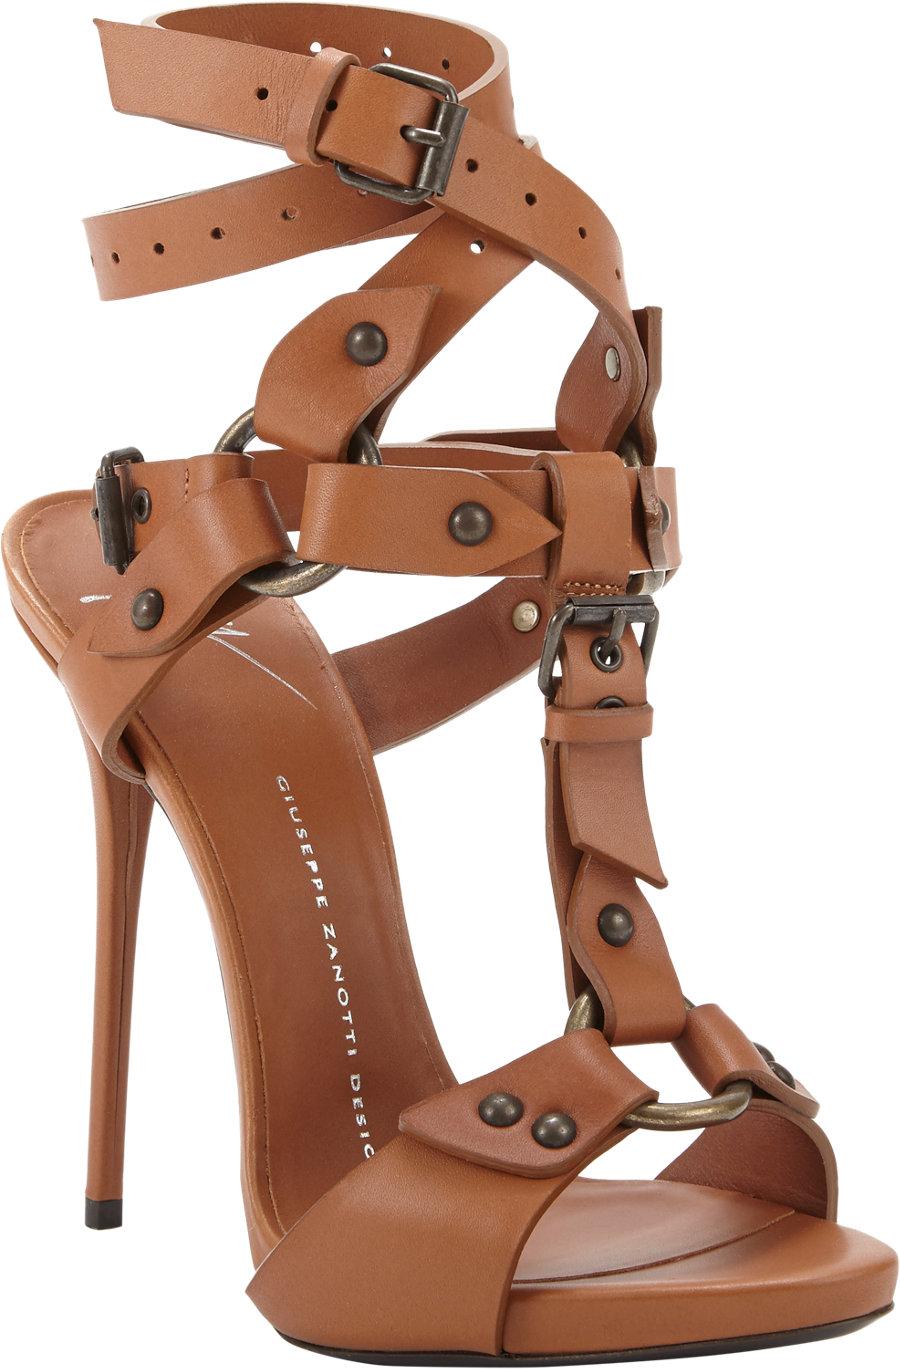 6bec3e1807b Lyst - Giuseppe Zanotti T-Strap Ankle Wrap Sandal in Brown